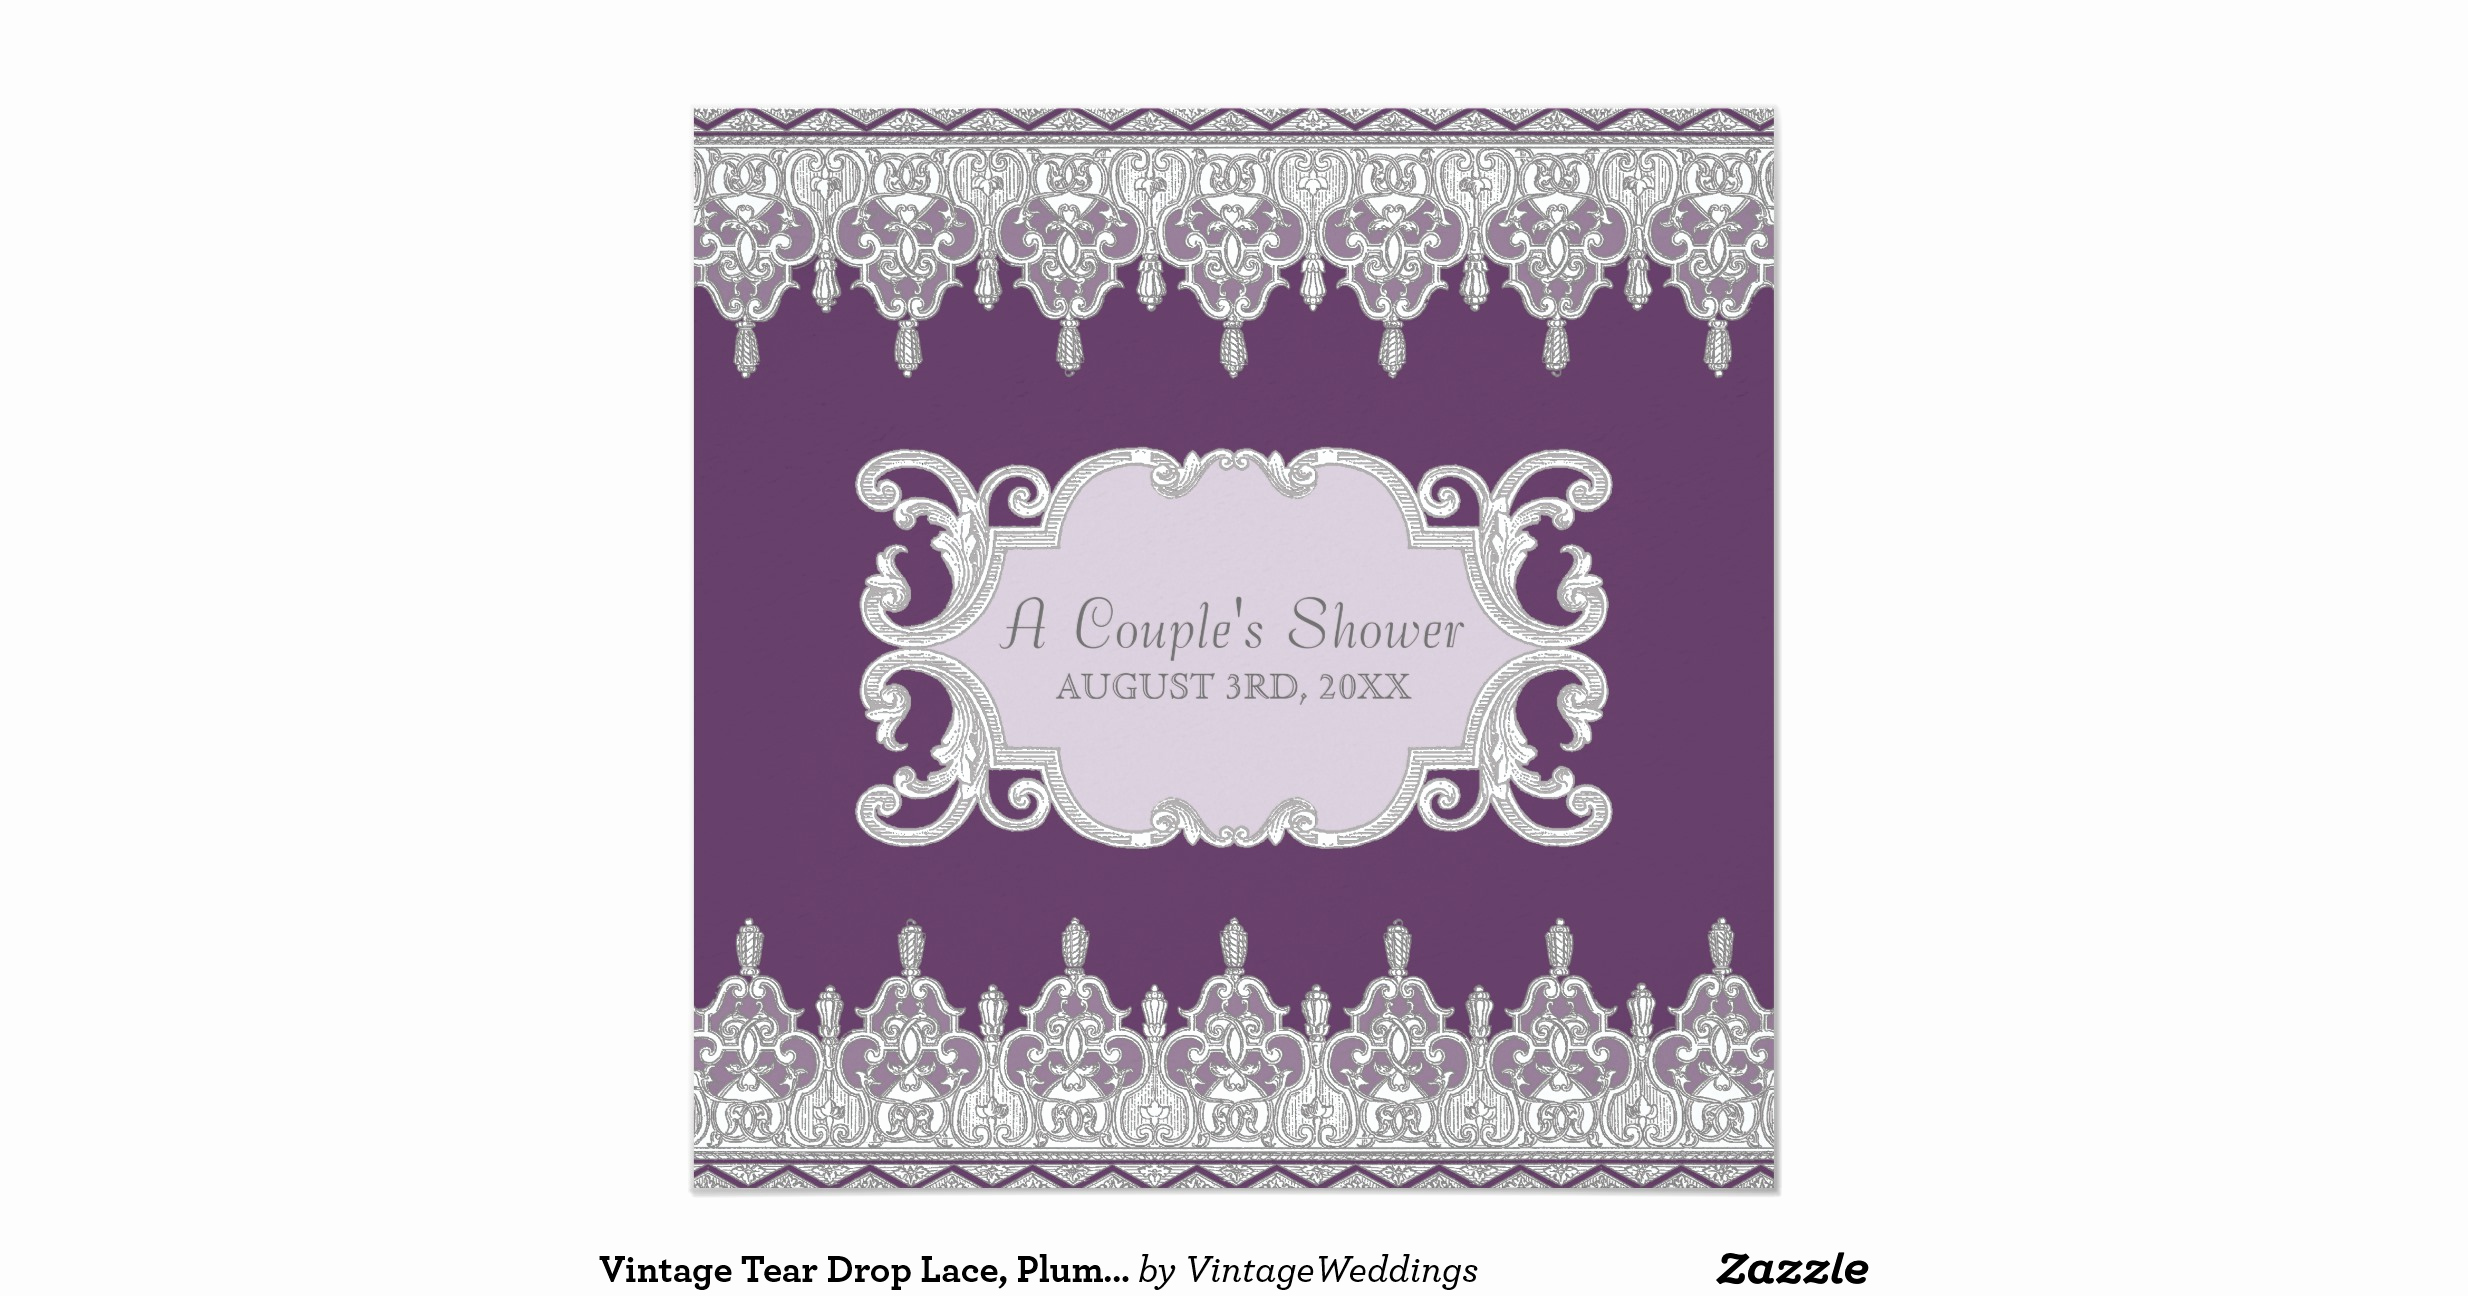 Drop In Shower Invitation Wording Fresh Vintage Tear Drop Lace Plum Grey Bridal Shower Invitation